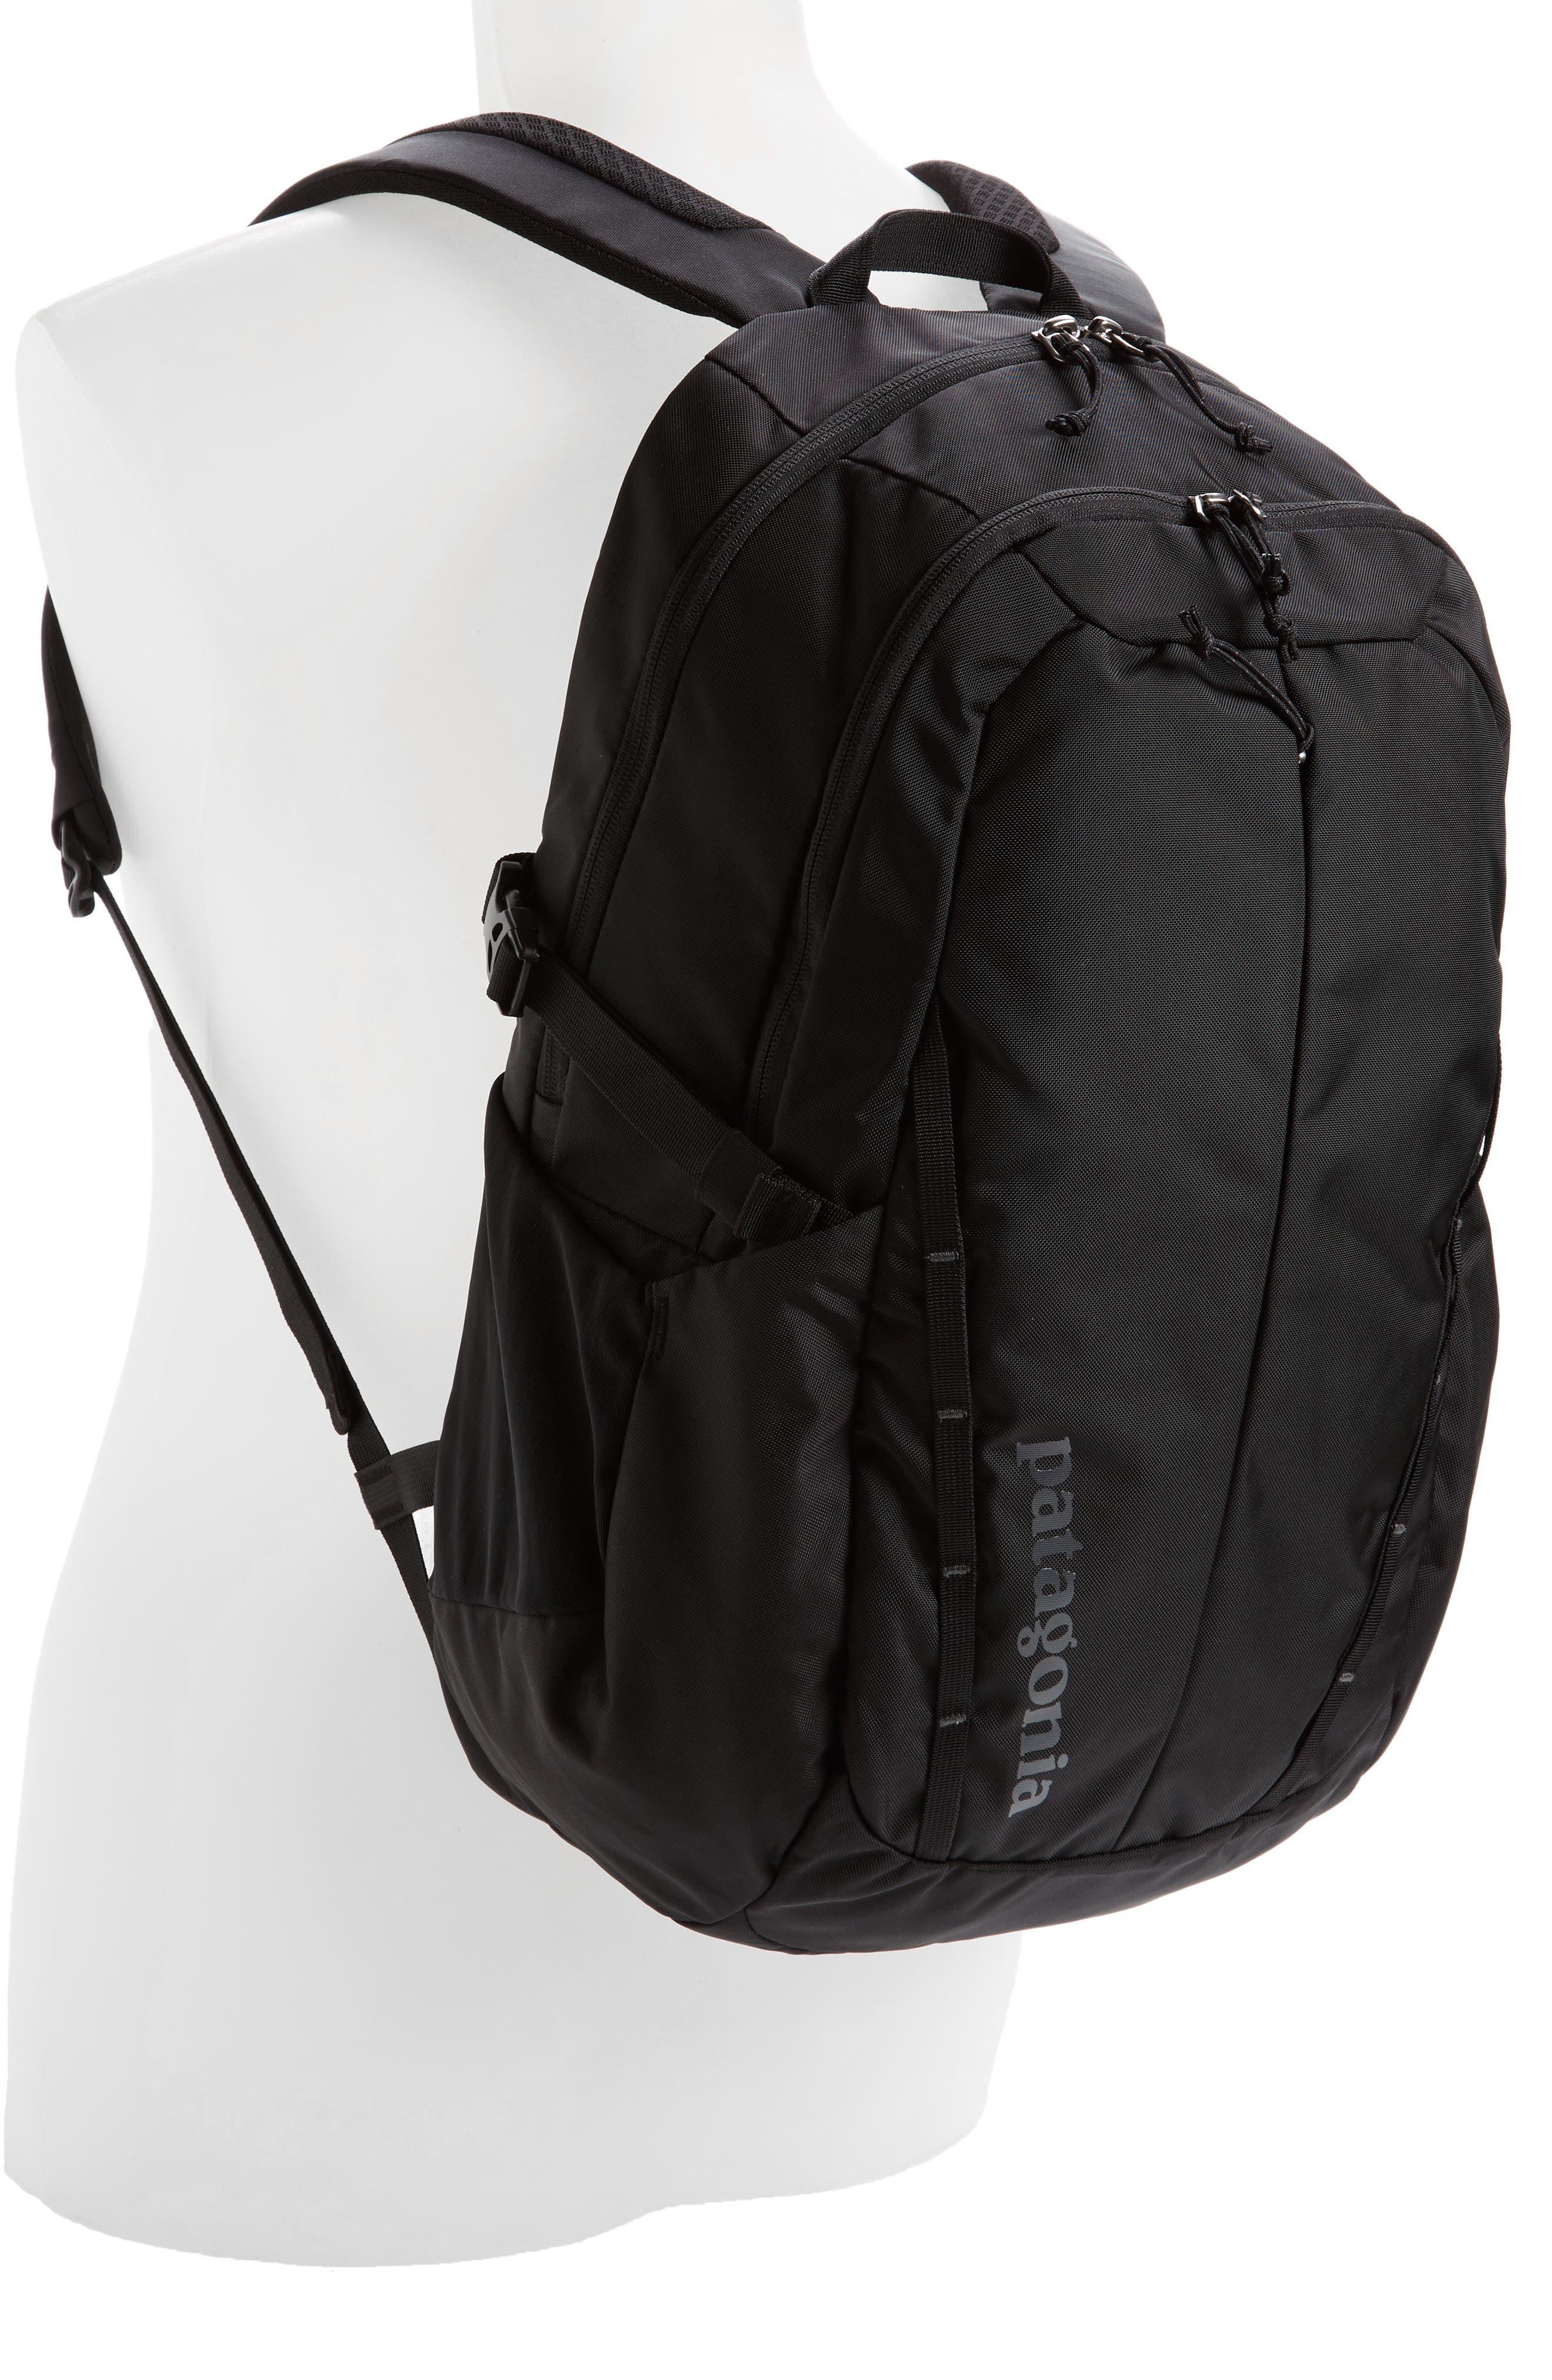 PATAGONIA, Refugio 28-Liter Backpack, Alternate thumbnail 2, color, 001